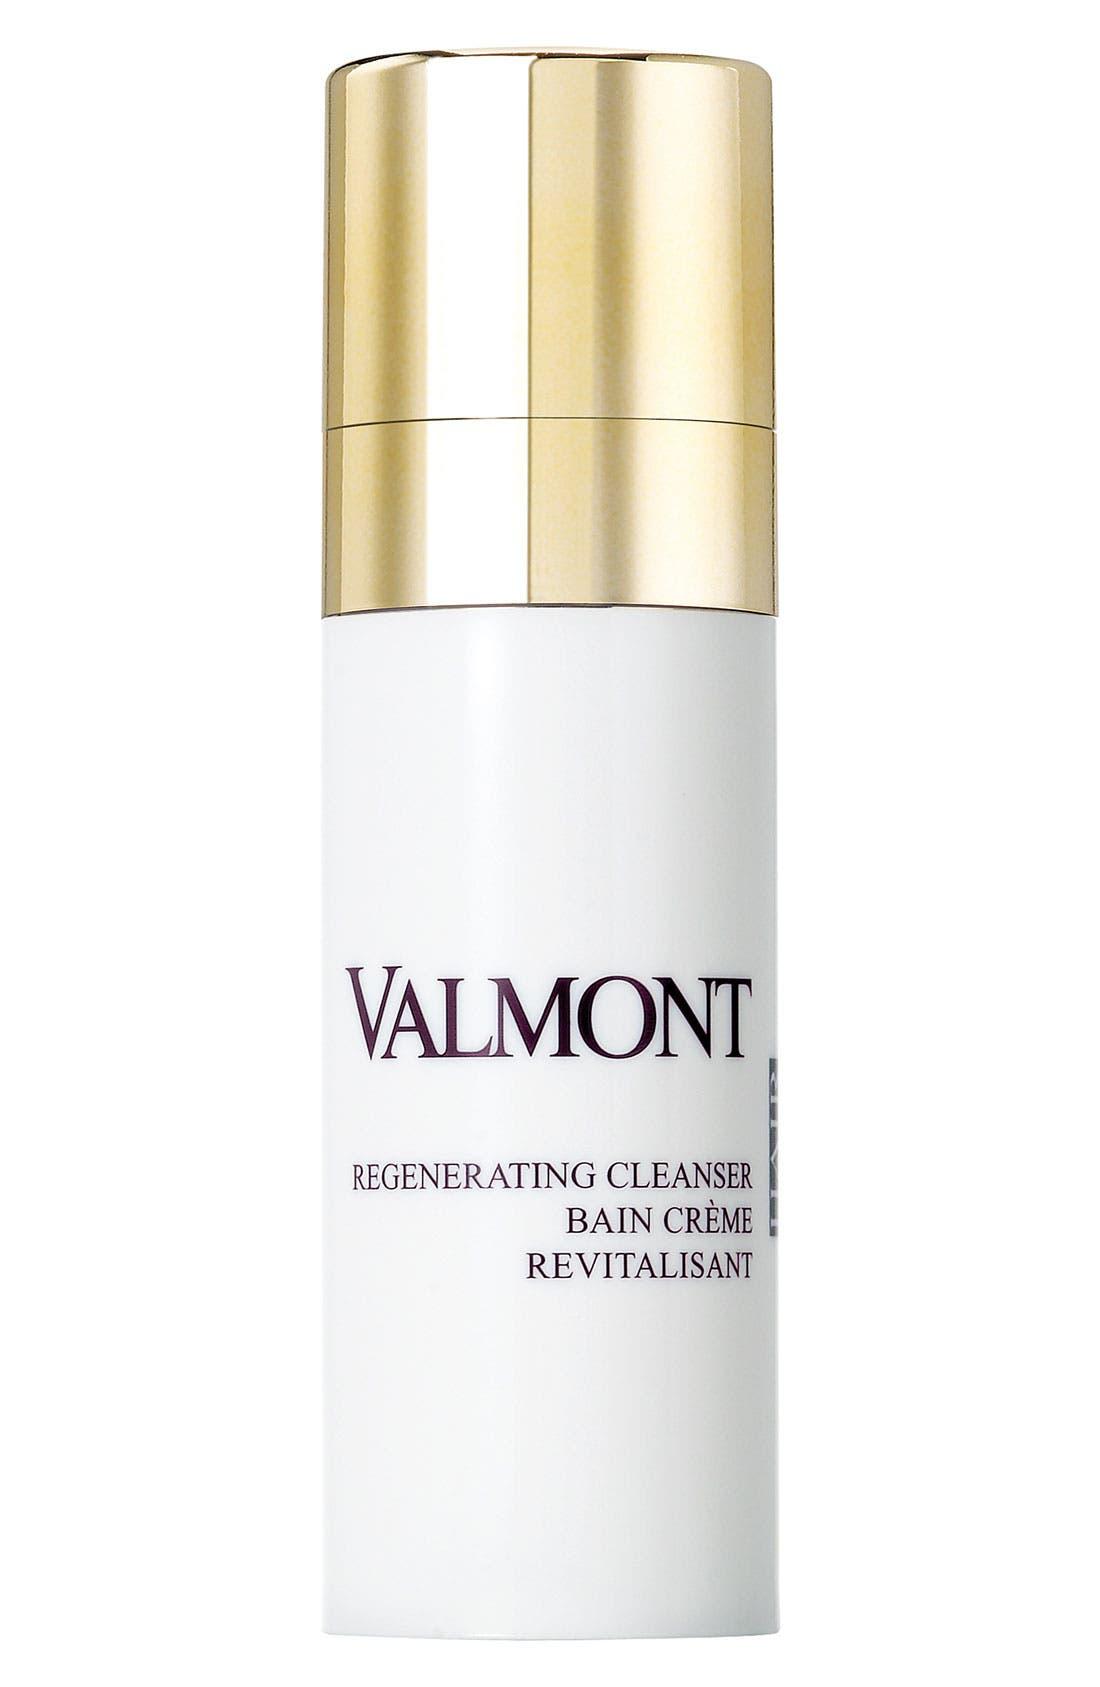 Valmont 'Hair Repair' Regenerating Cleanser